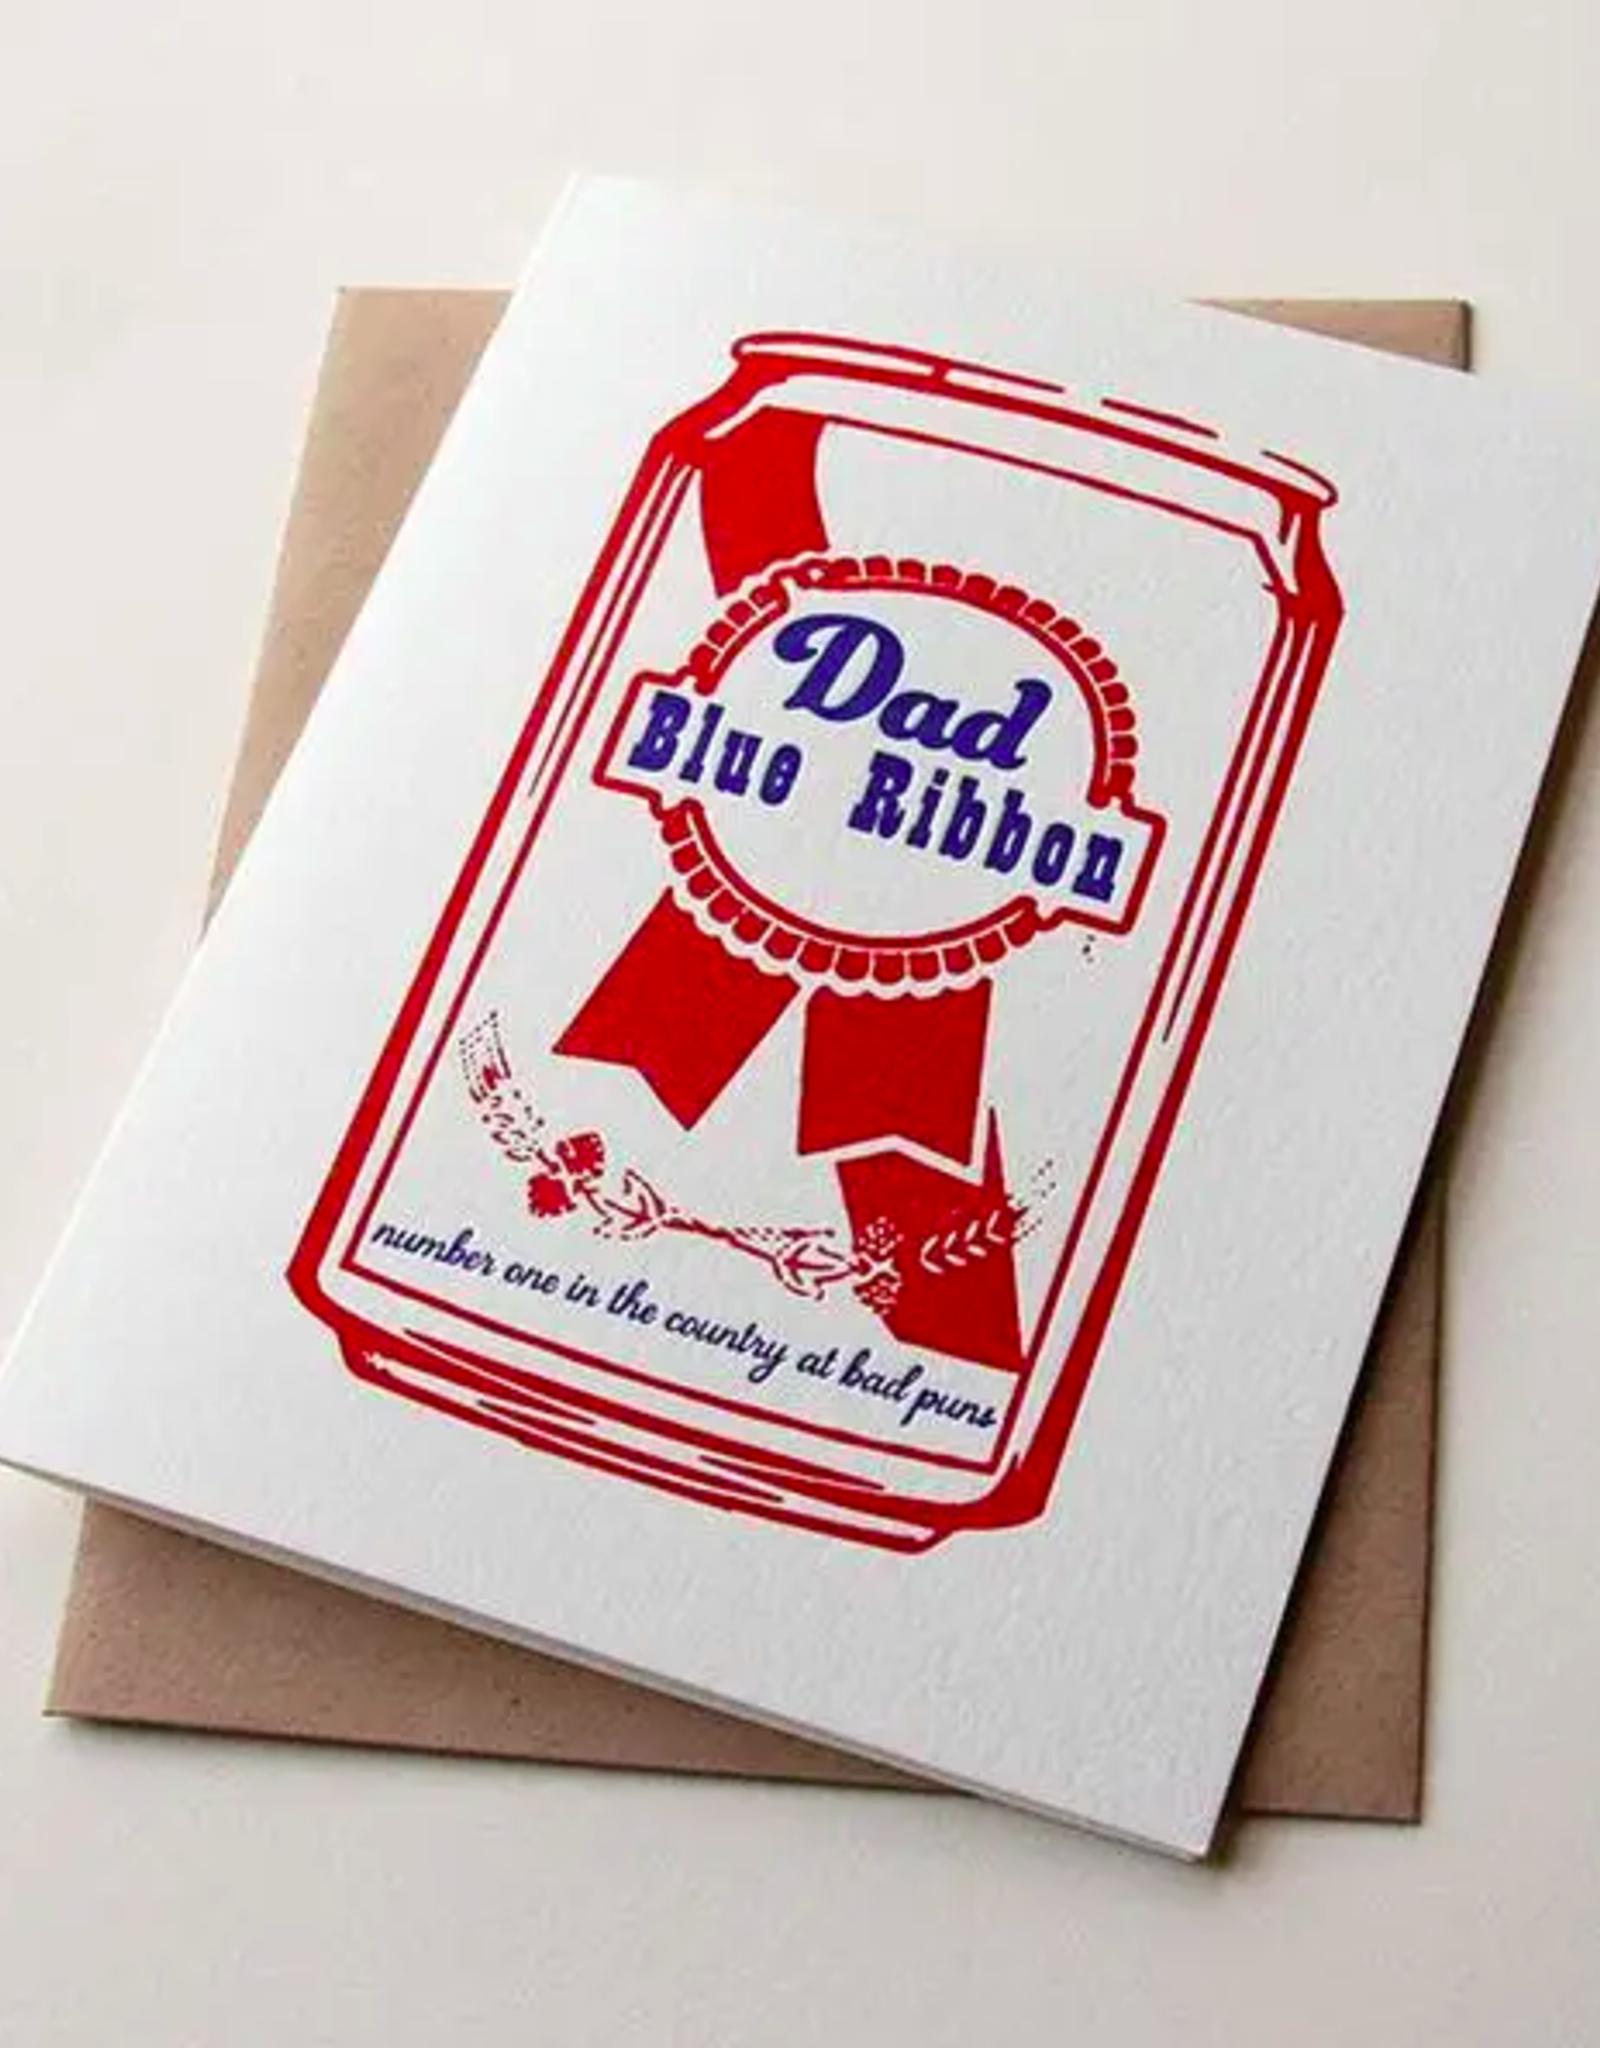 Blue Ribbon Dad Card